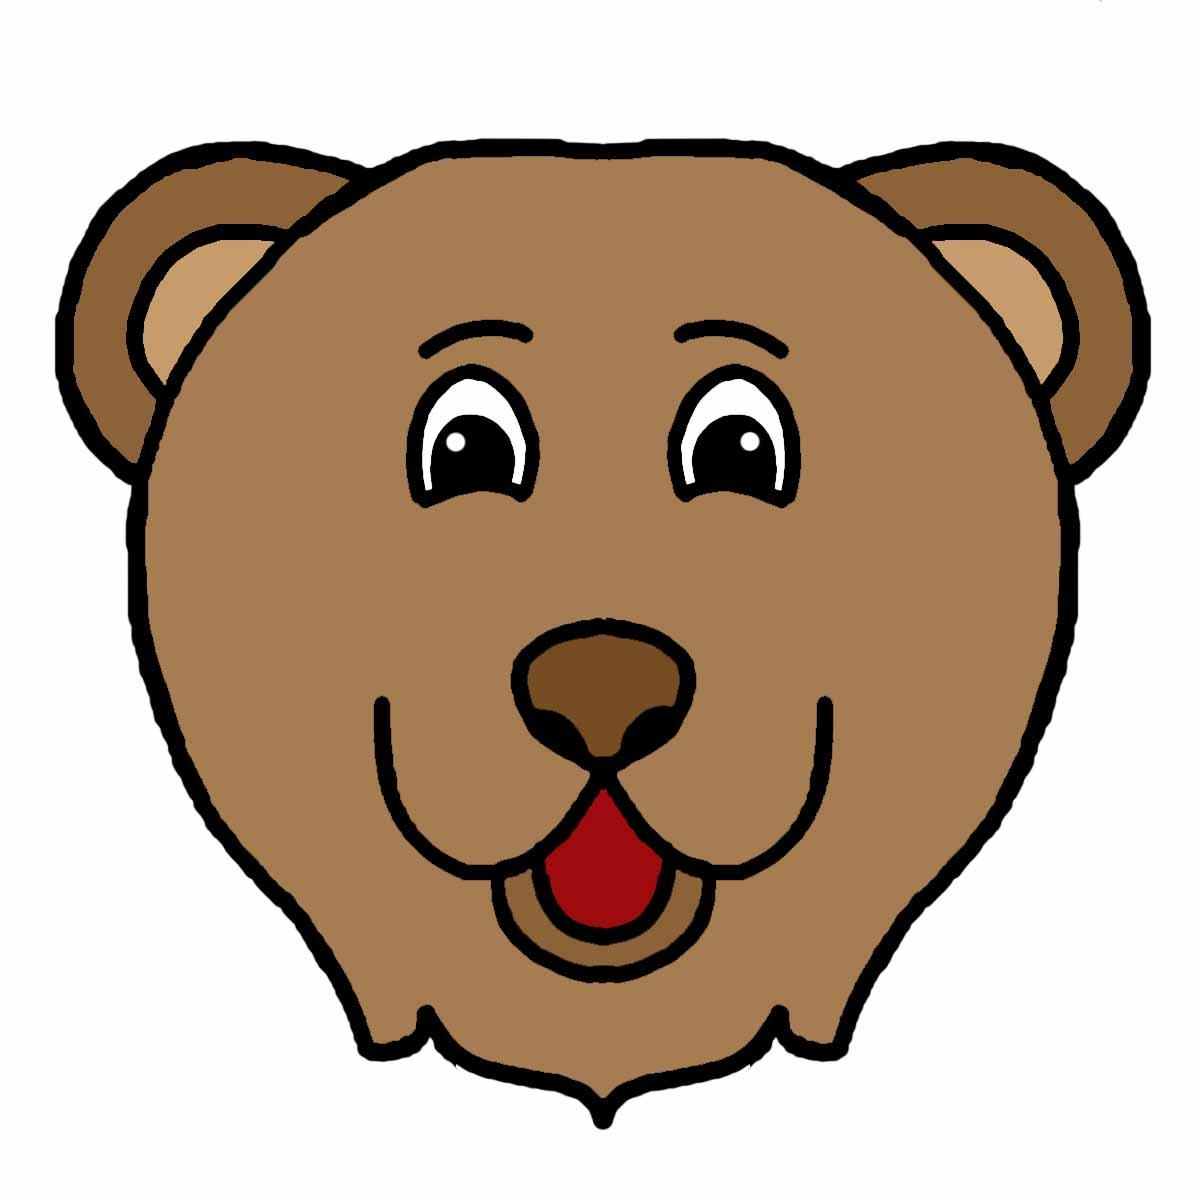 Symmetry clipart cartoon animal Frog Bear Cartoon Cartoon Faces: